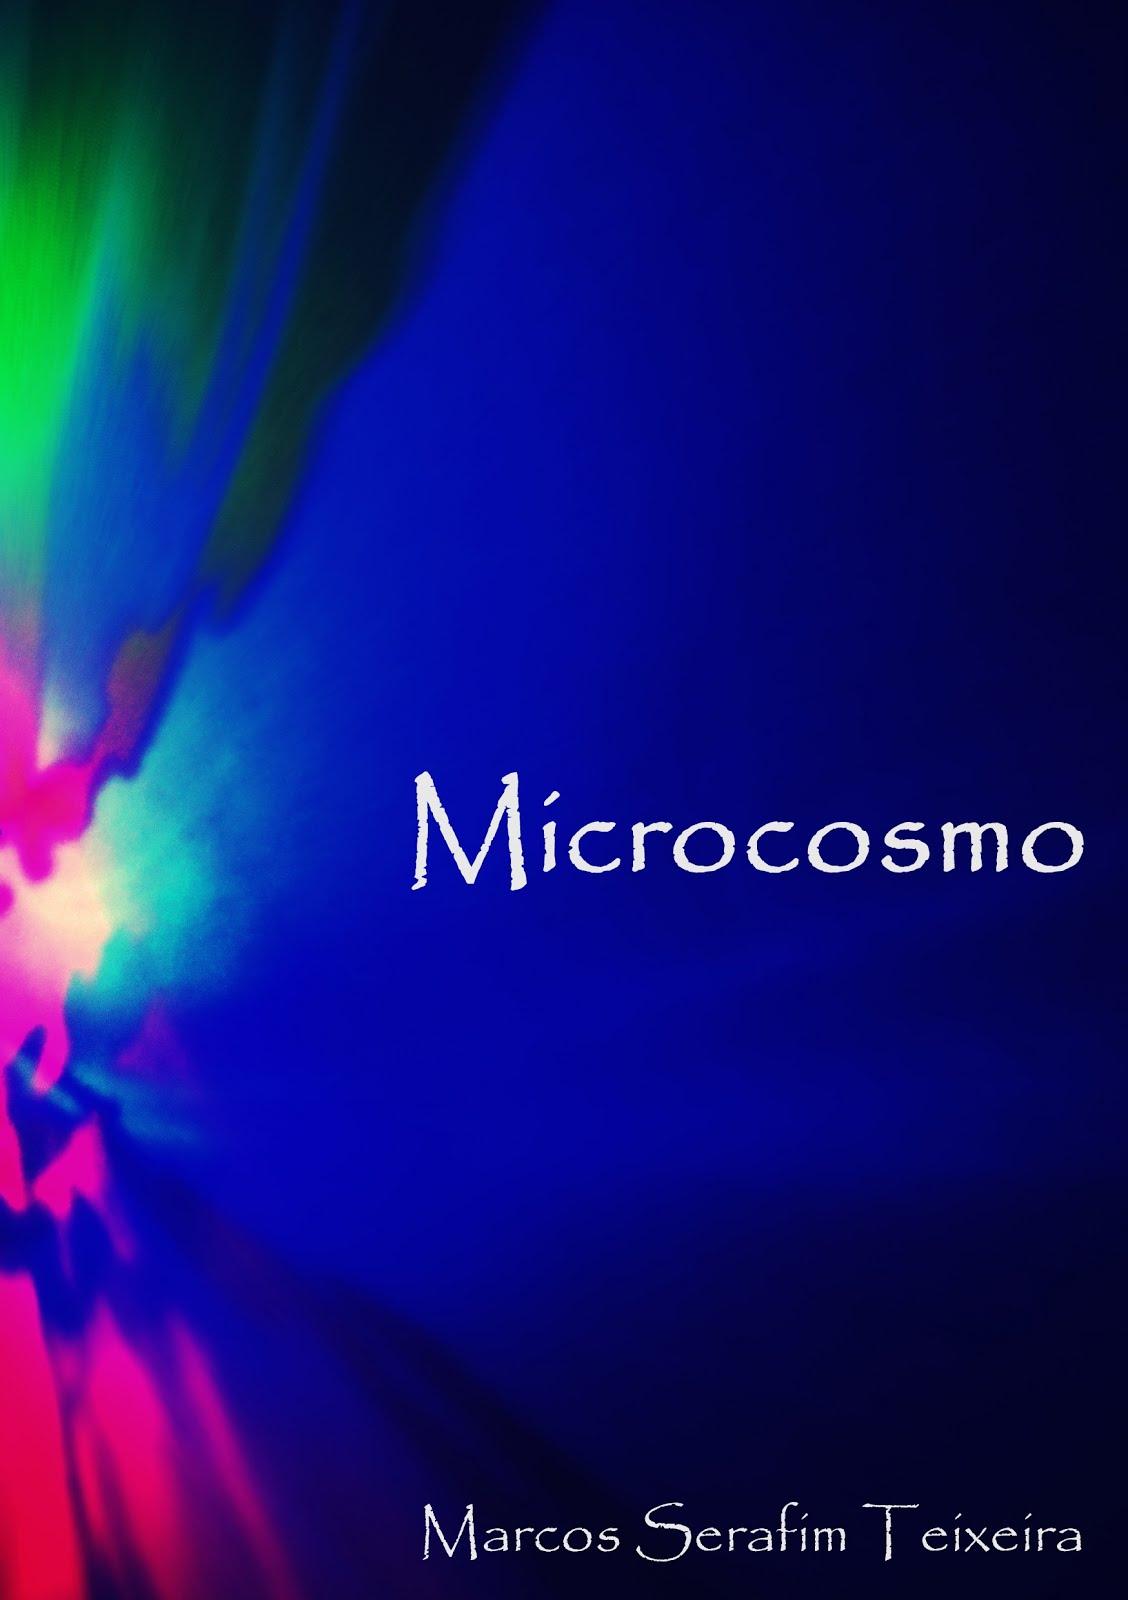 Microcosmo